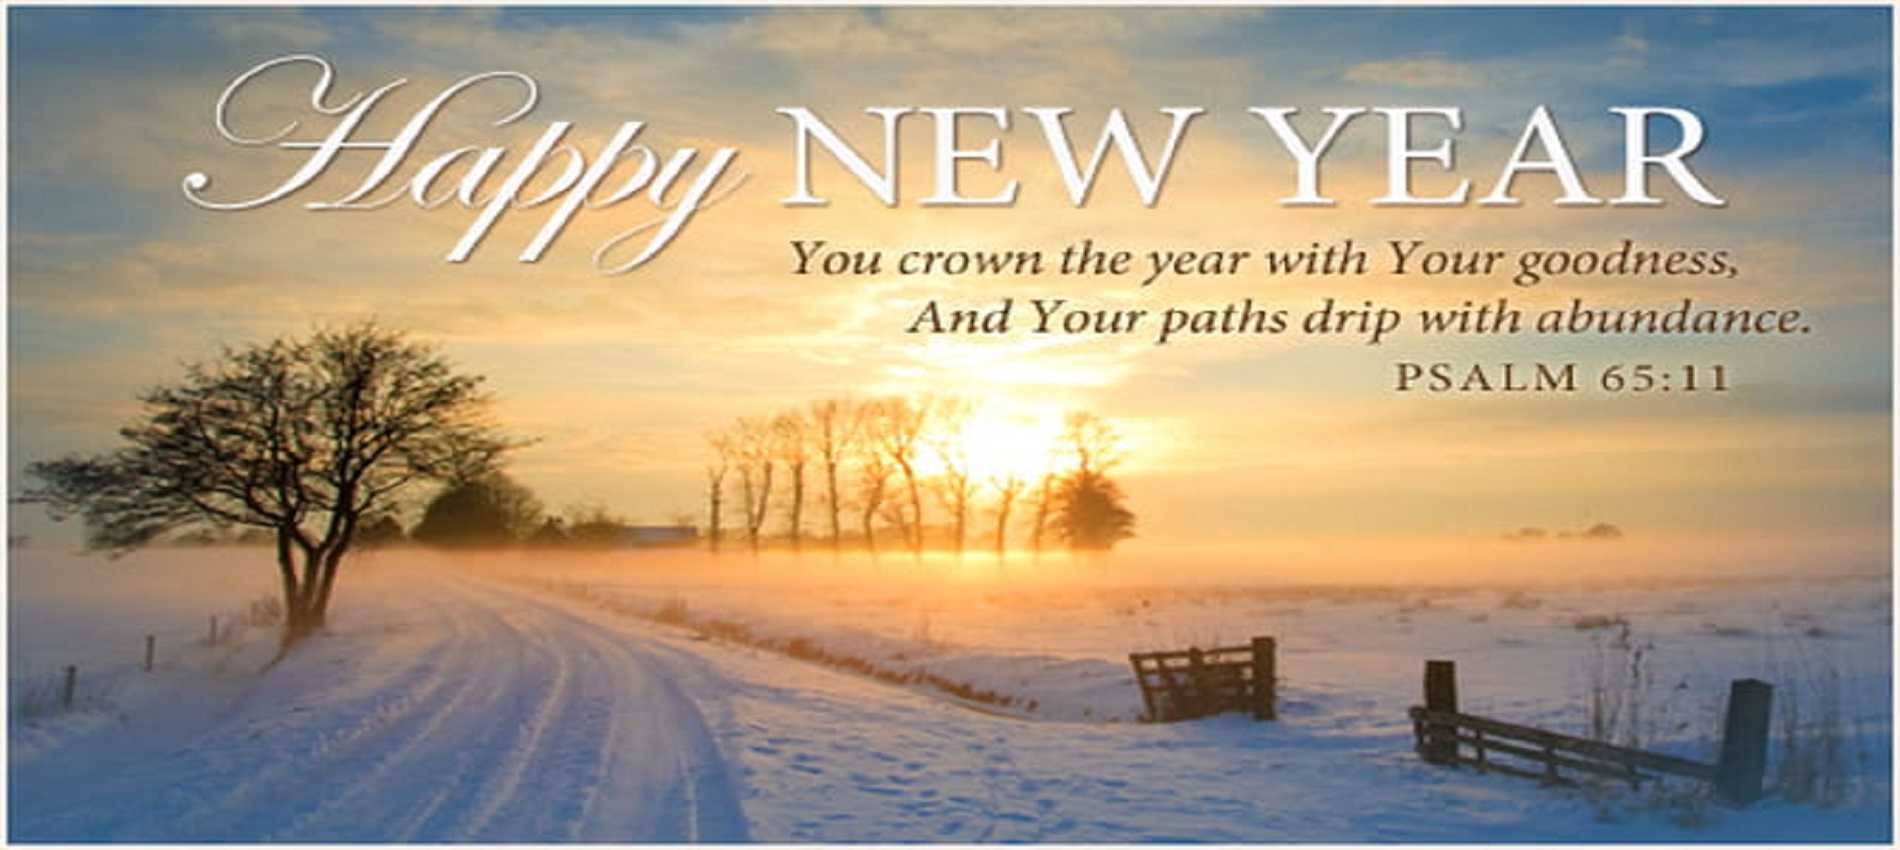 Happy New Year Slider